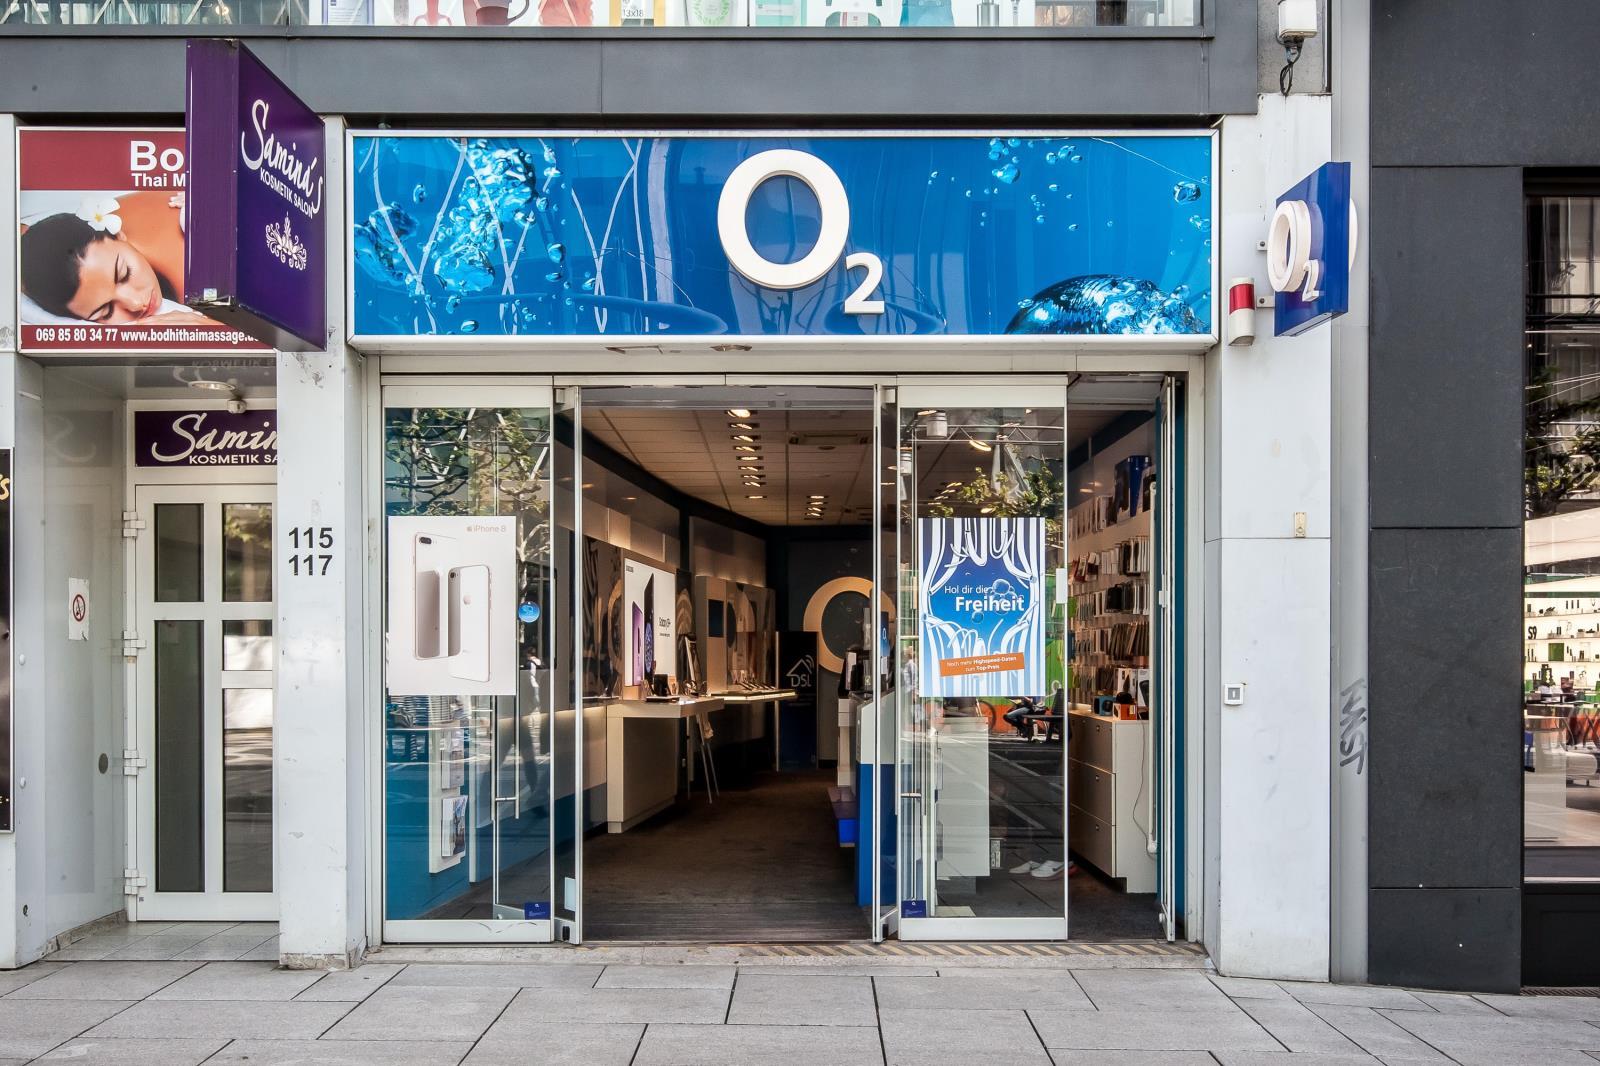 o2 Shop, Zeil 115-117 in Frankfurt am Main